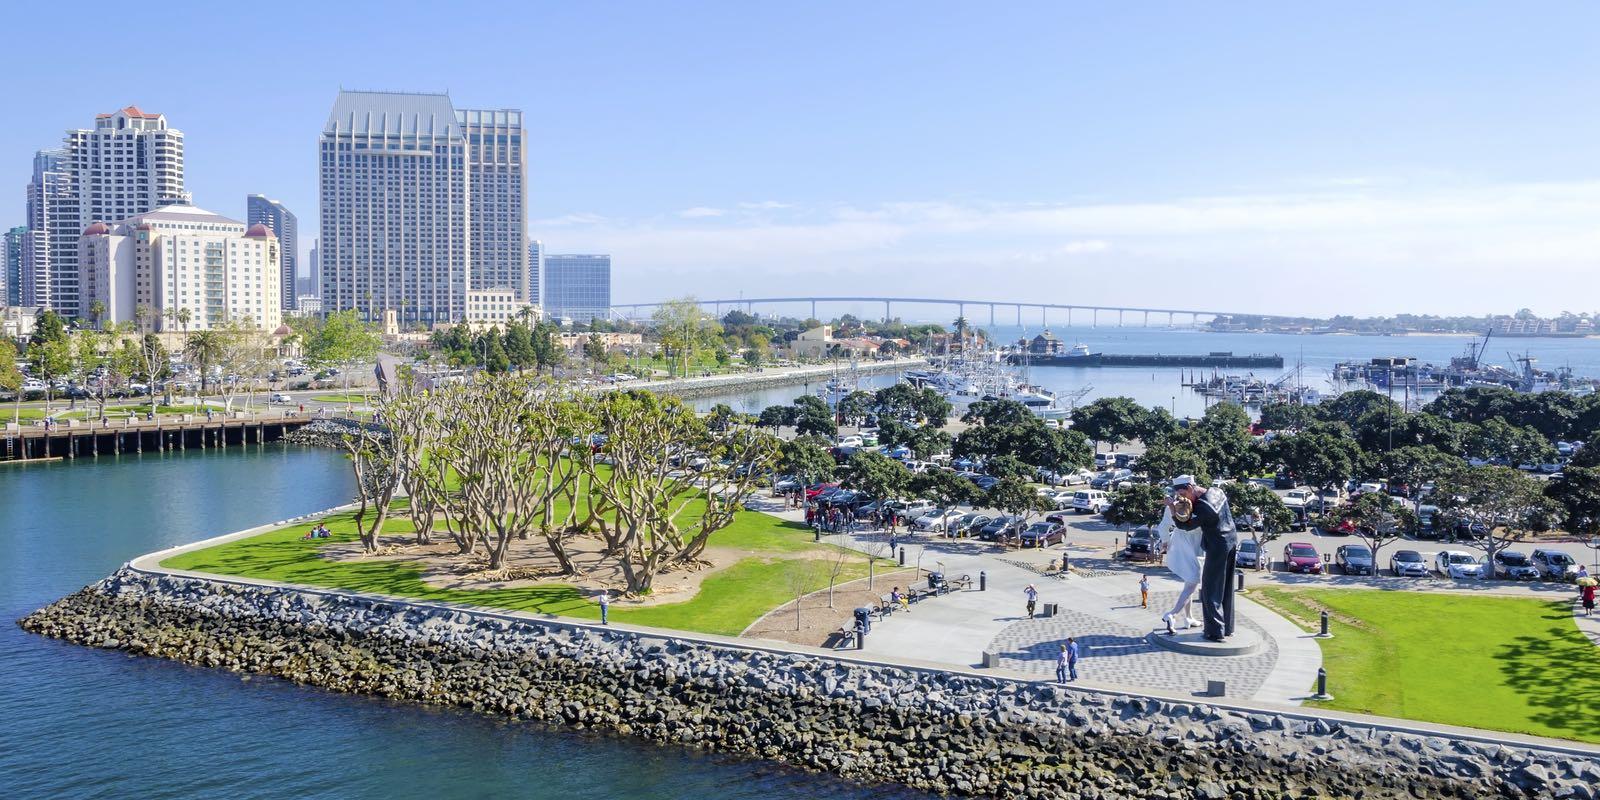 Tuna Harbor Park along the San Diego Embarcadero